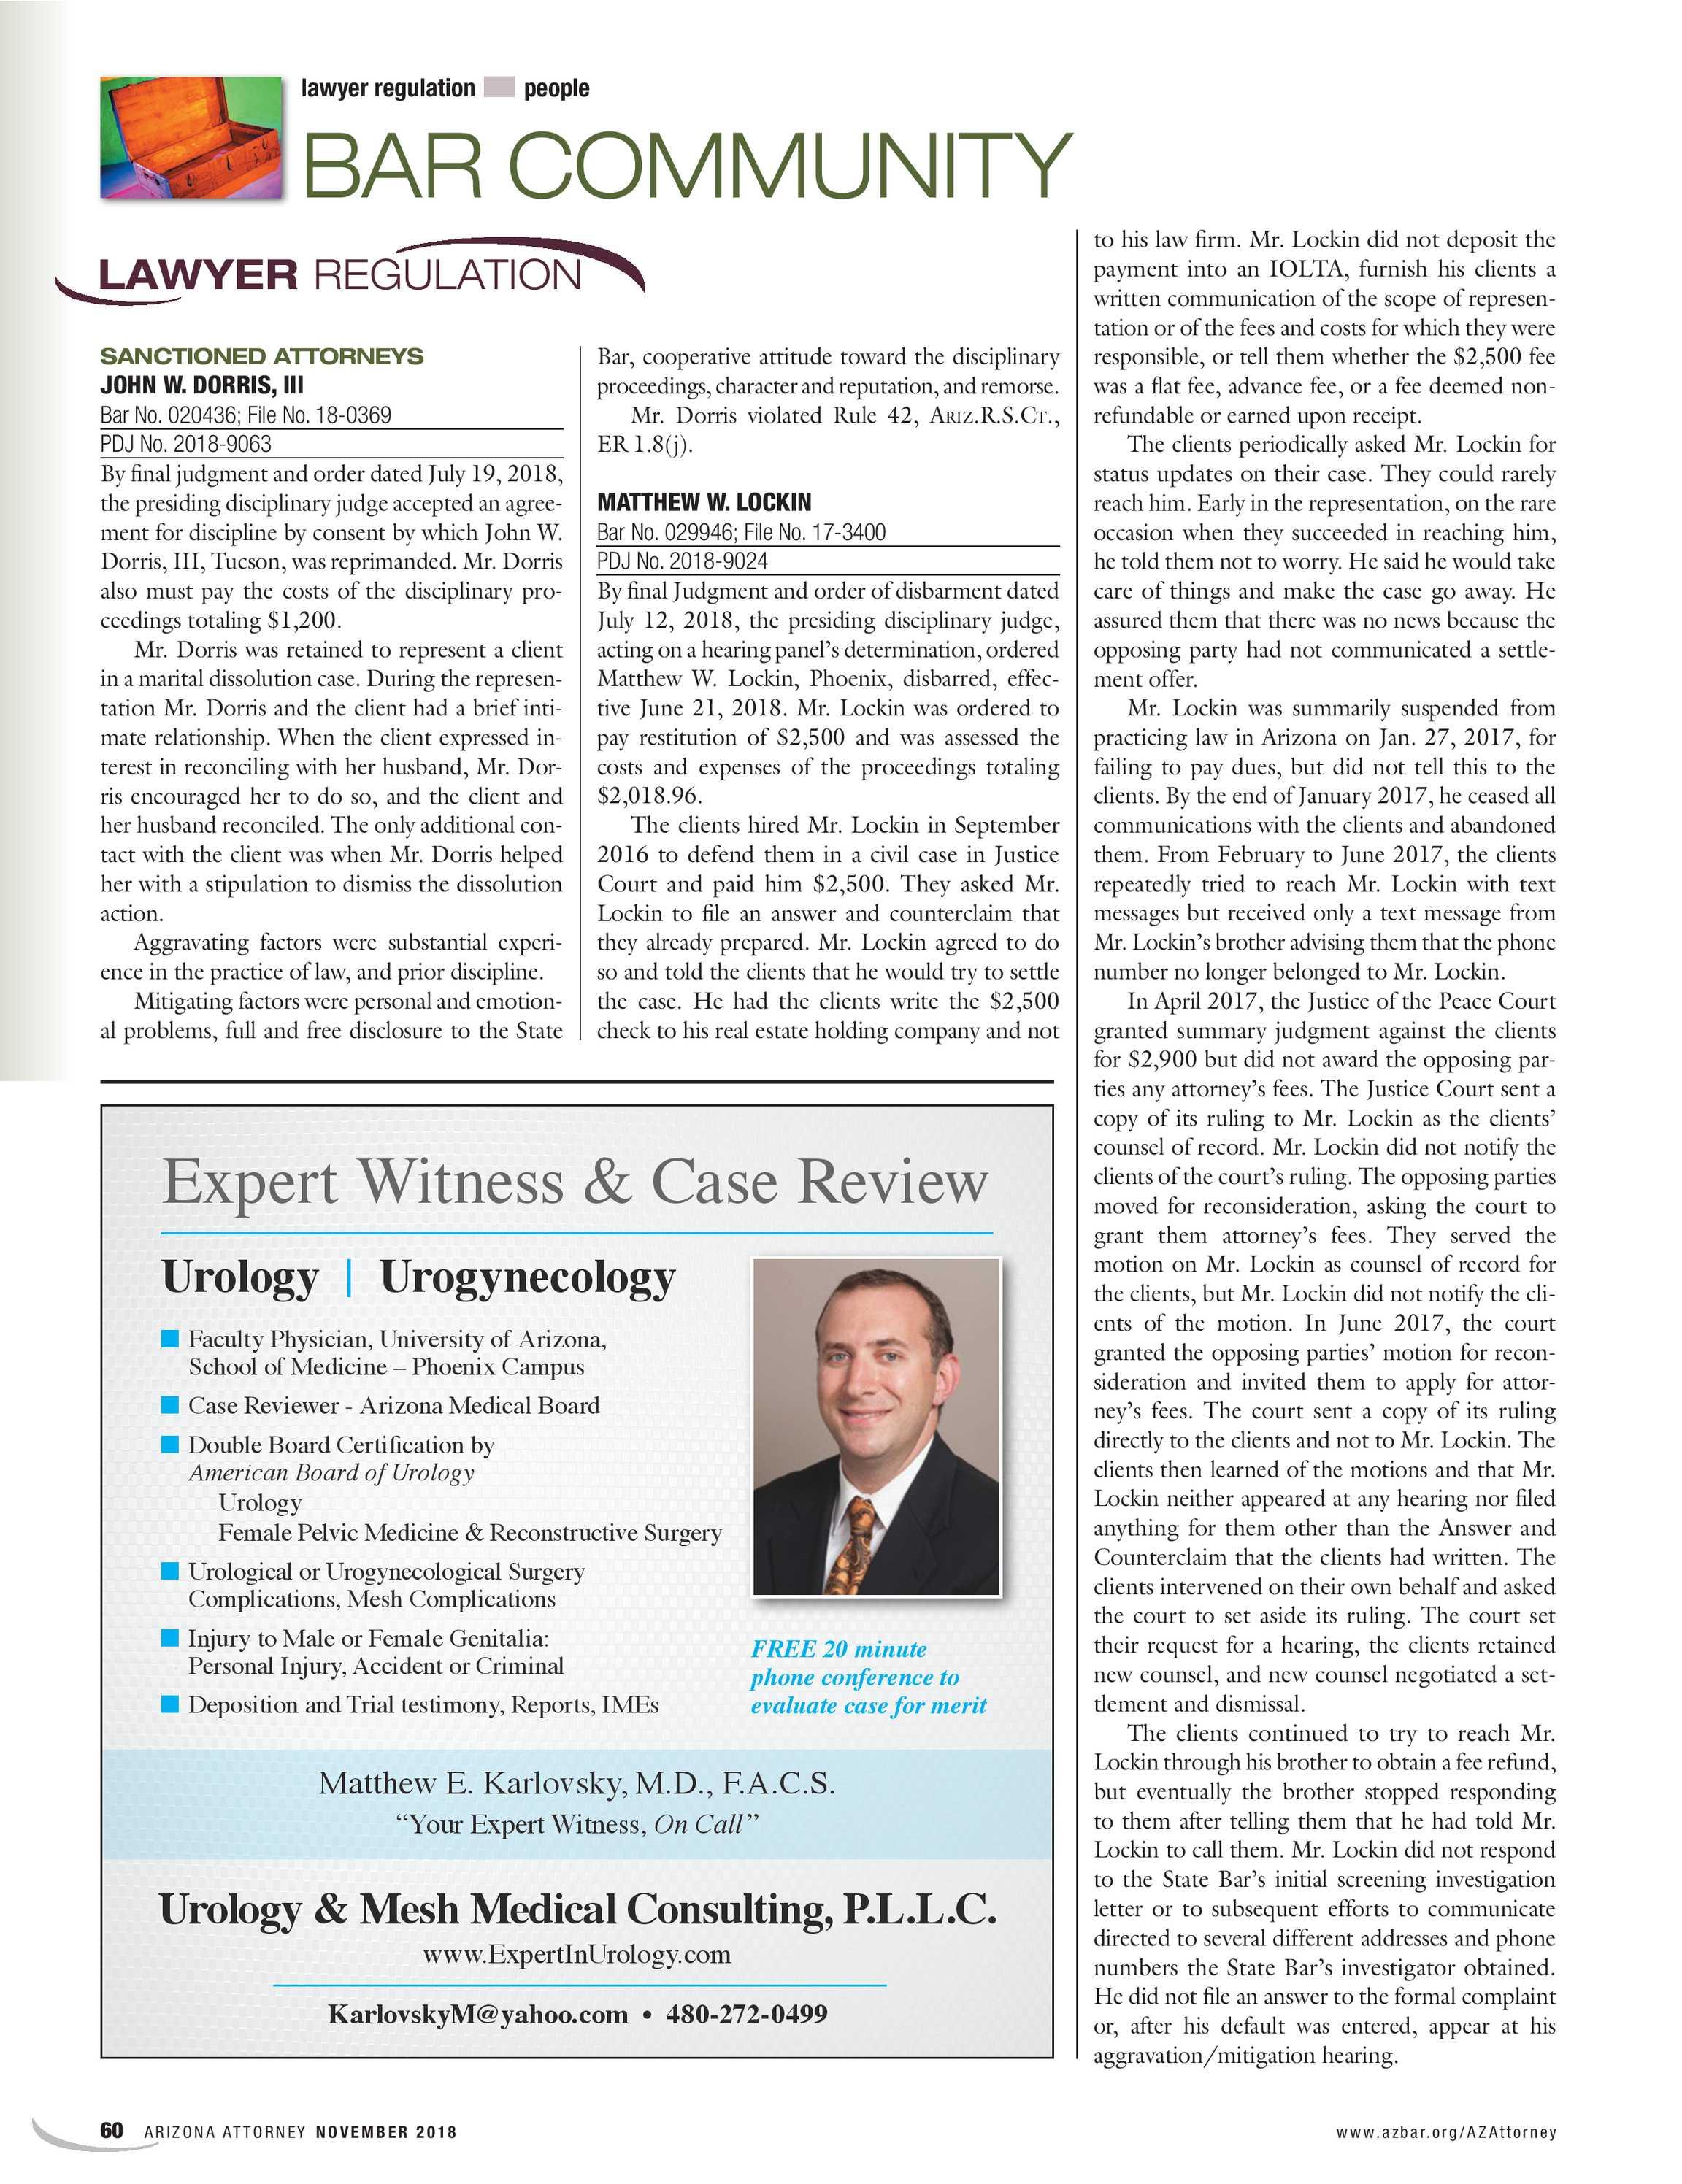 Arizona Attorney - November 2018 - page 60